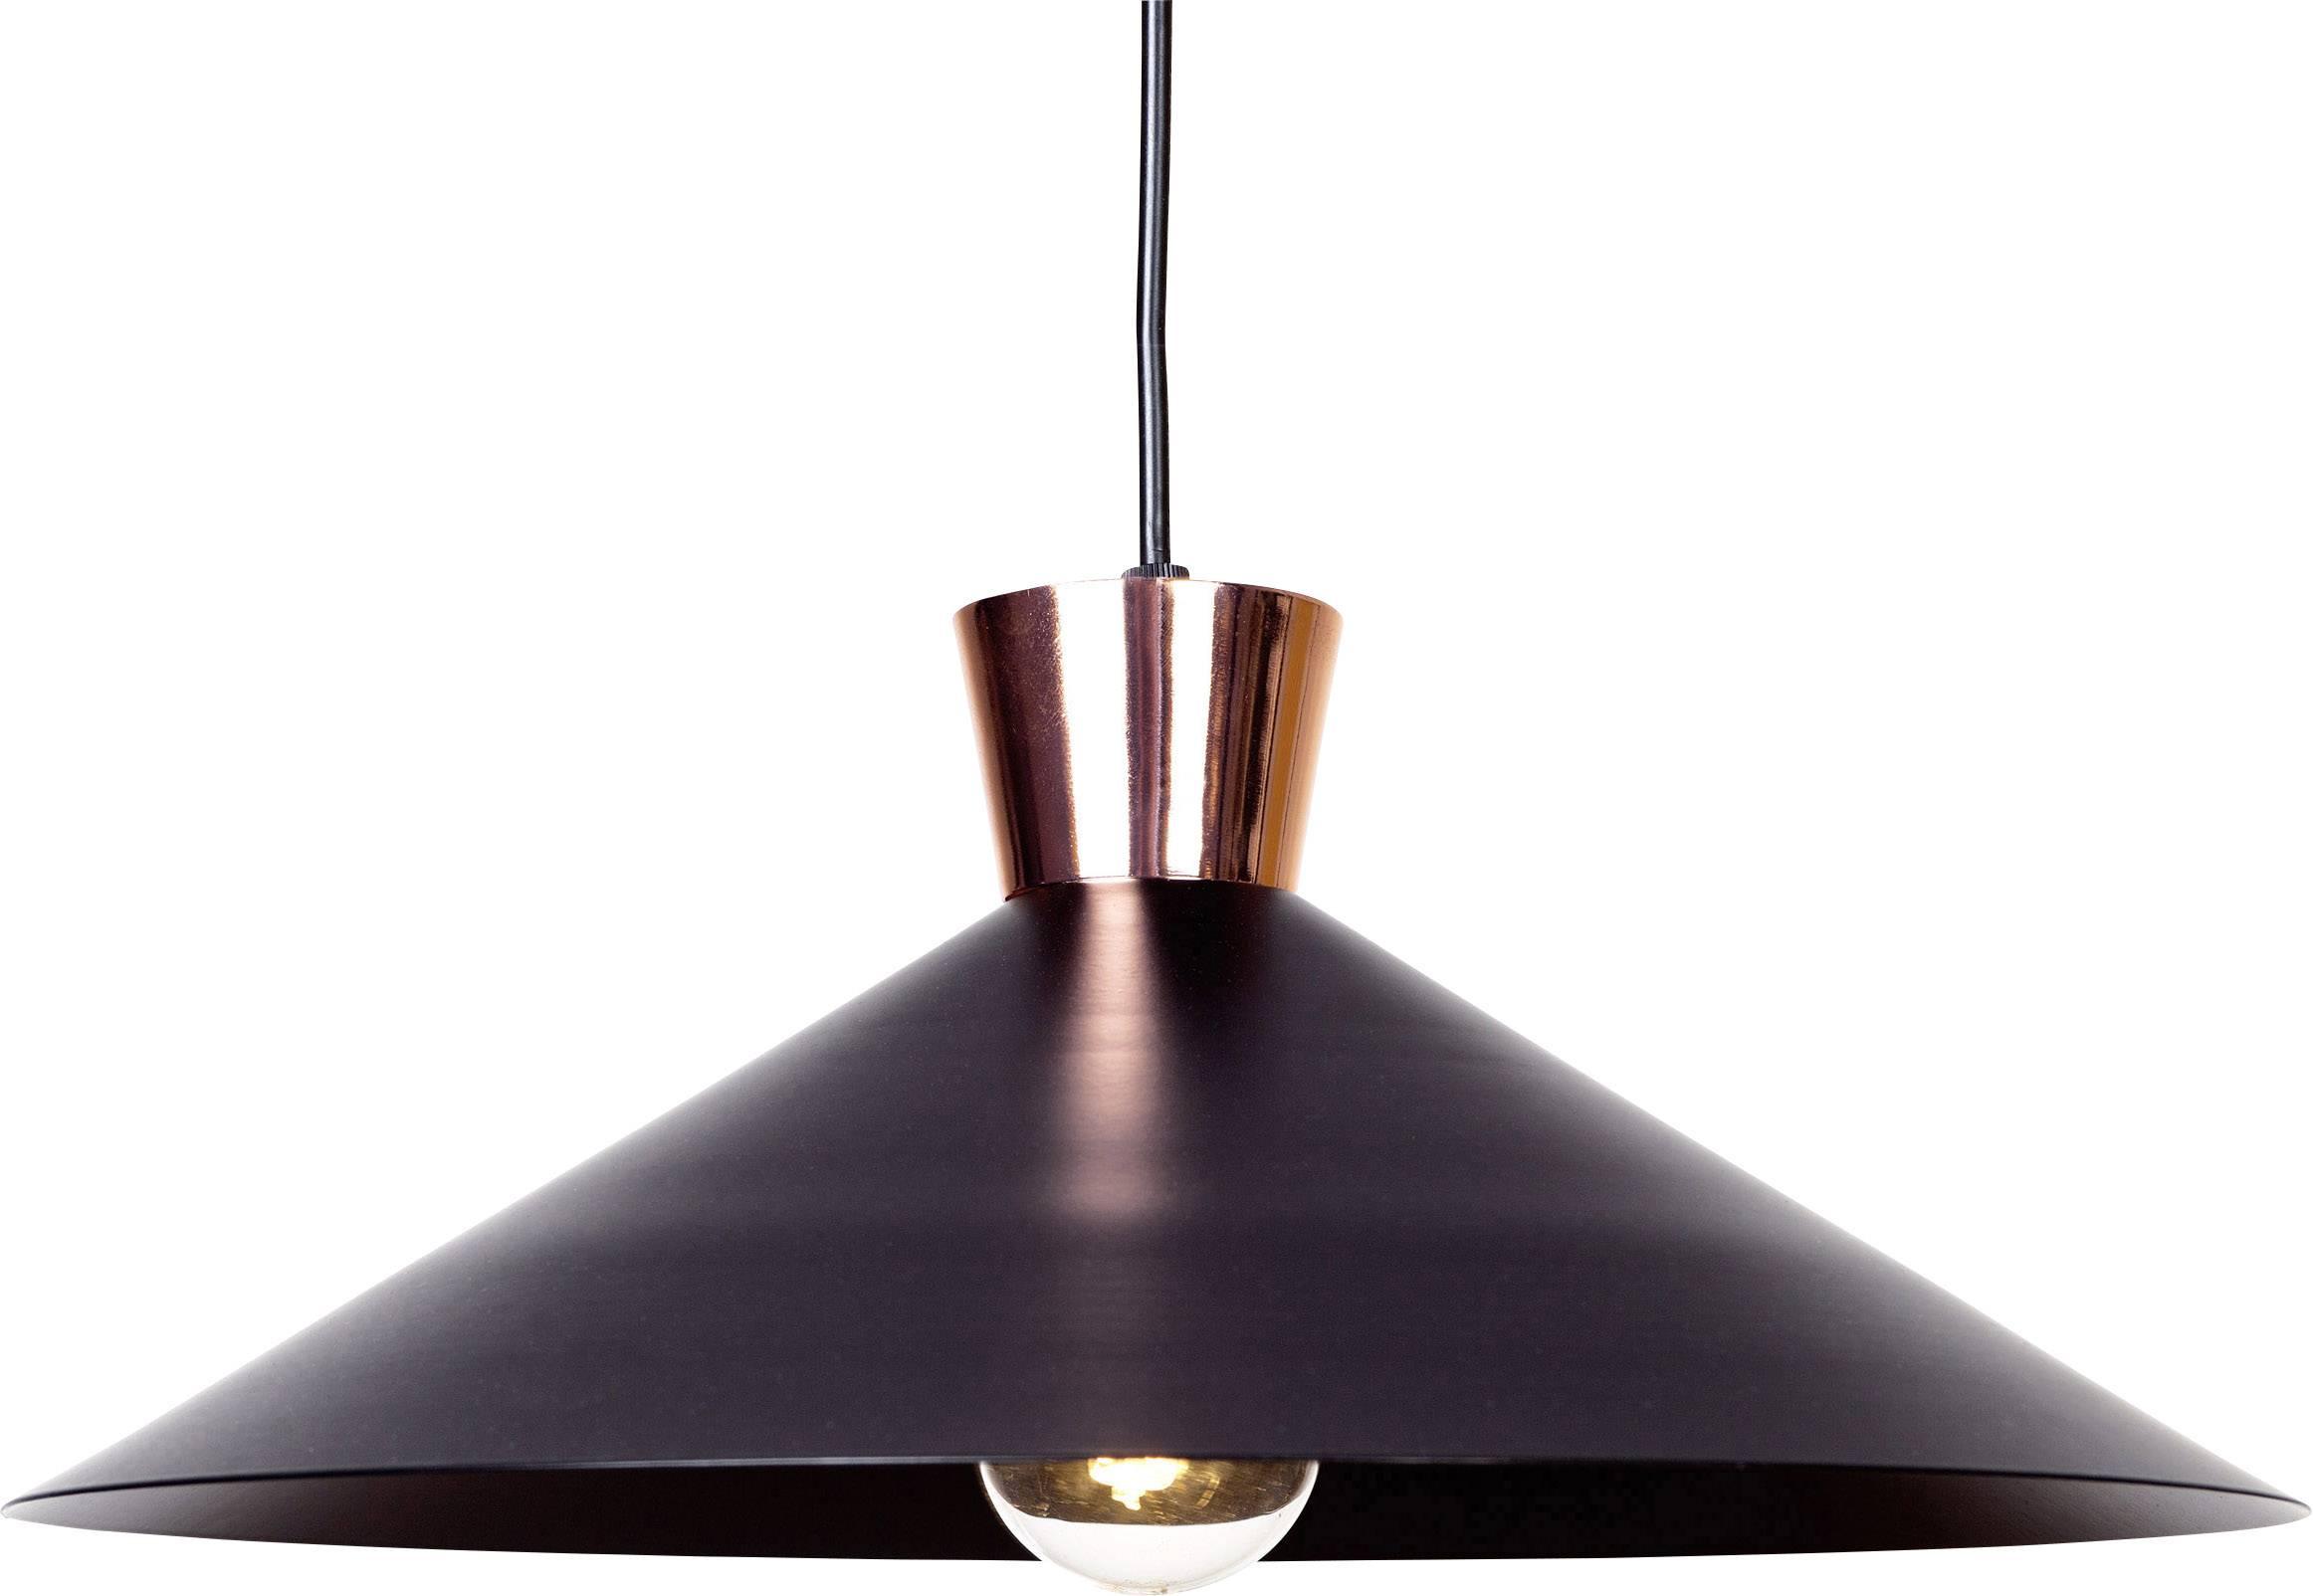 Erstaunlich Pendelleuchte Energiesparlampe E27 60 W Brilliant Mayfair 93460 76 QT89